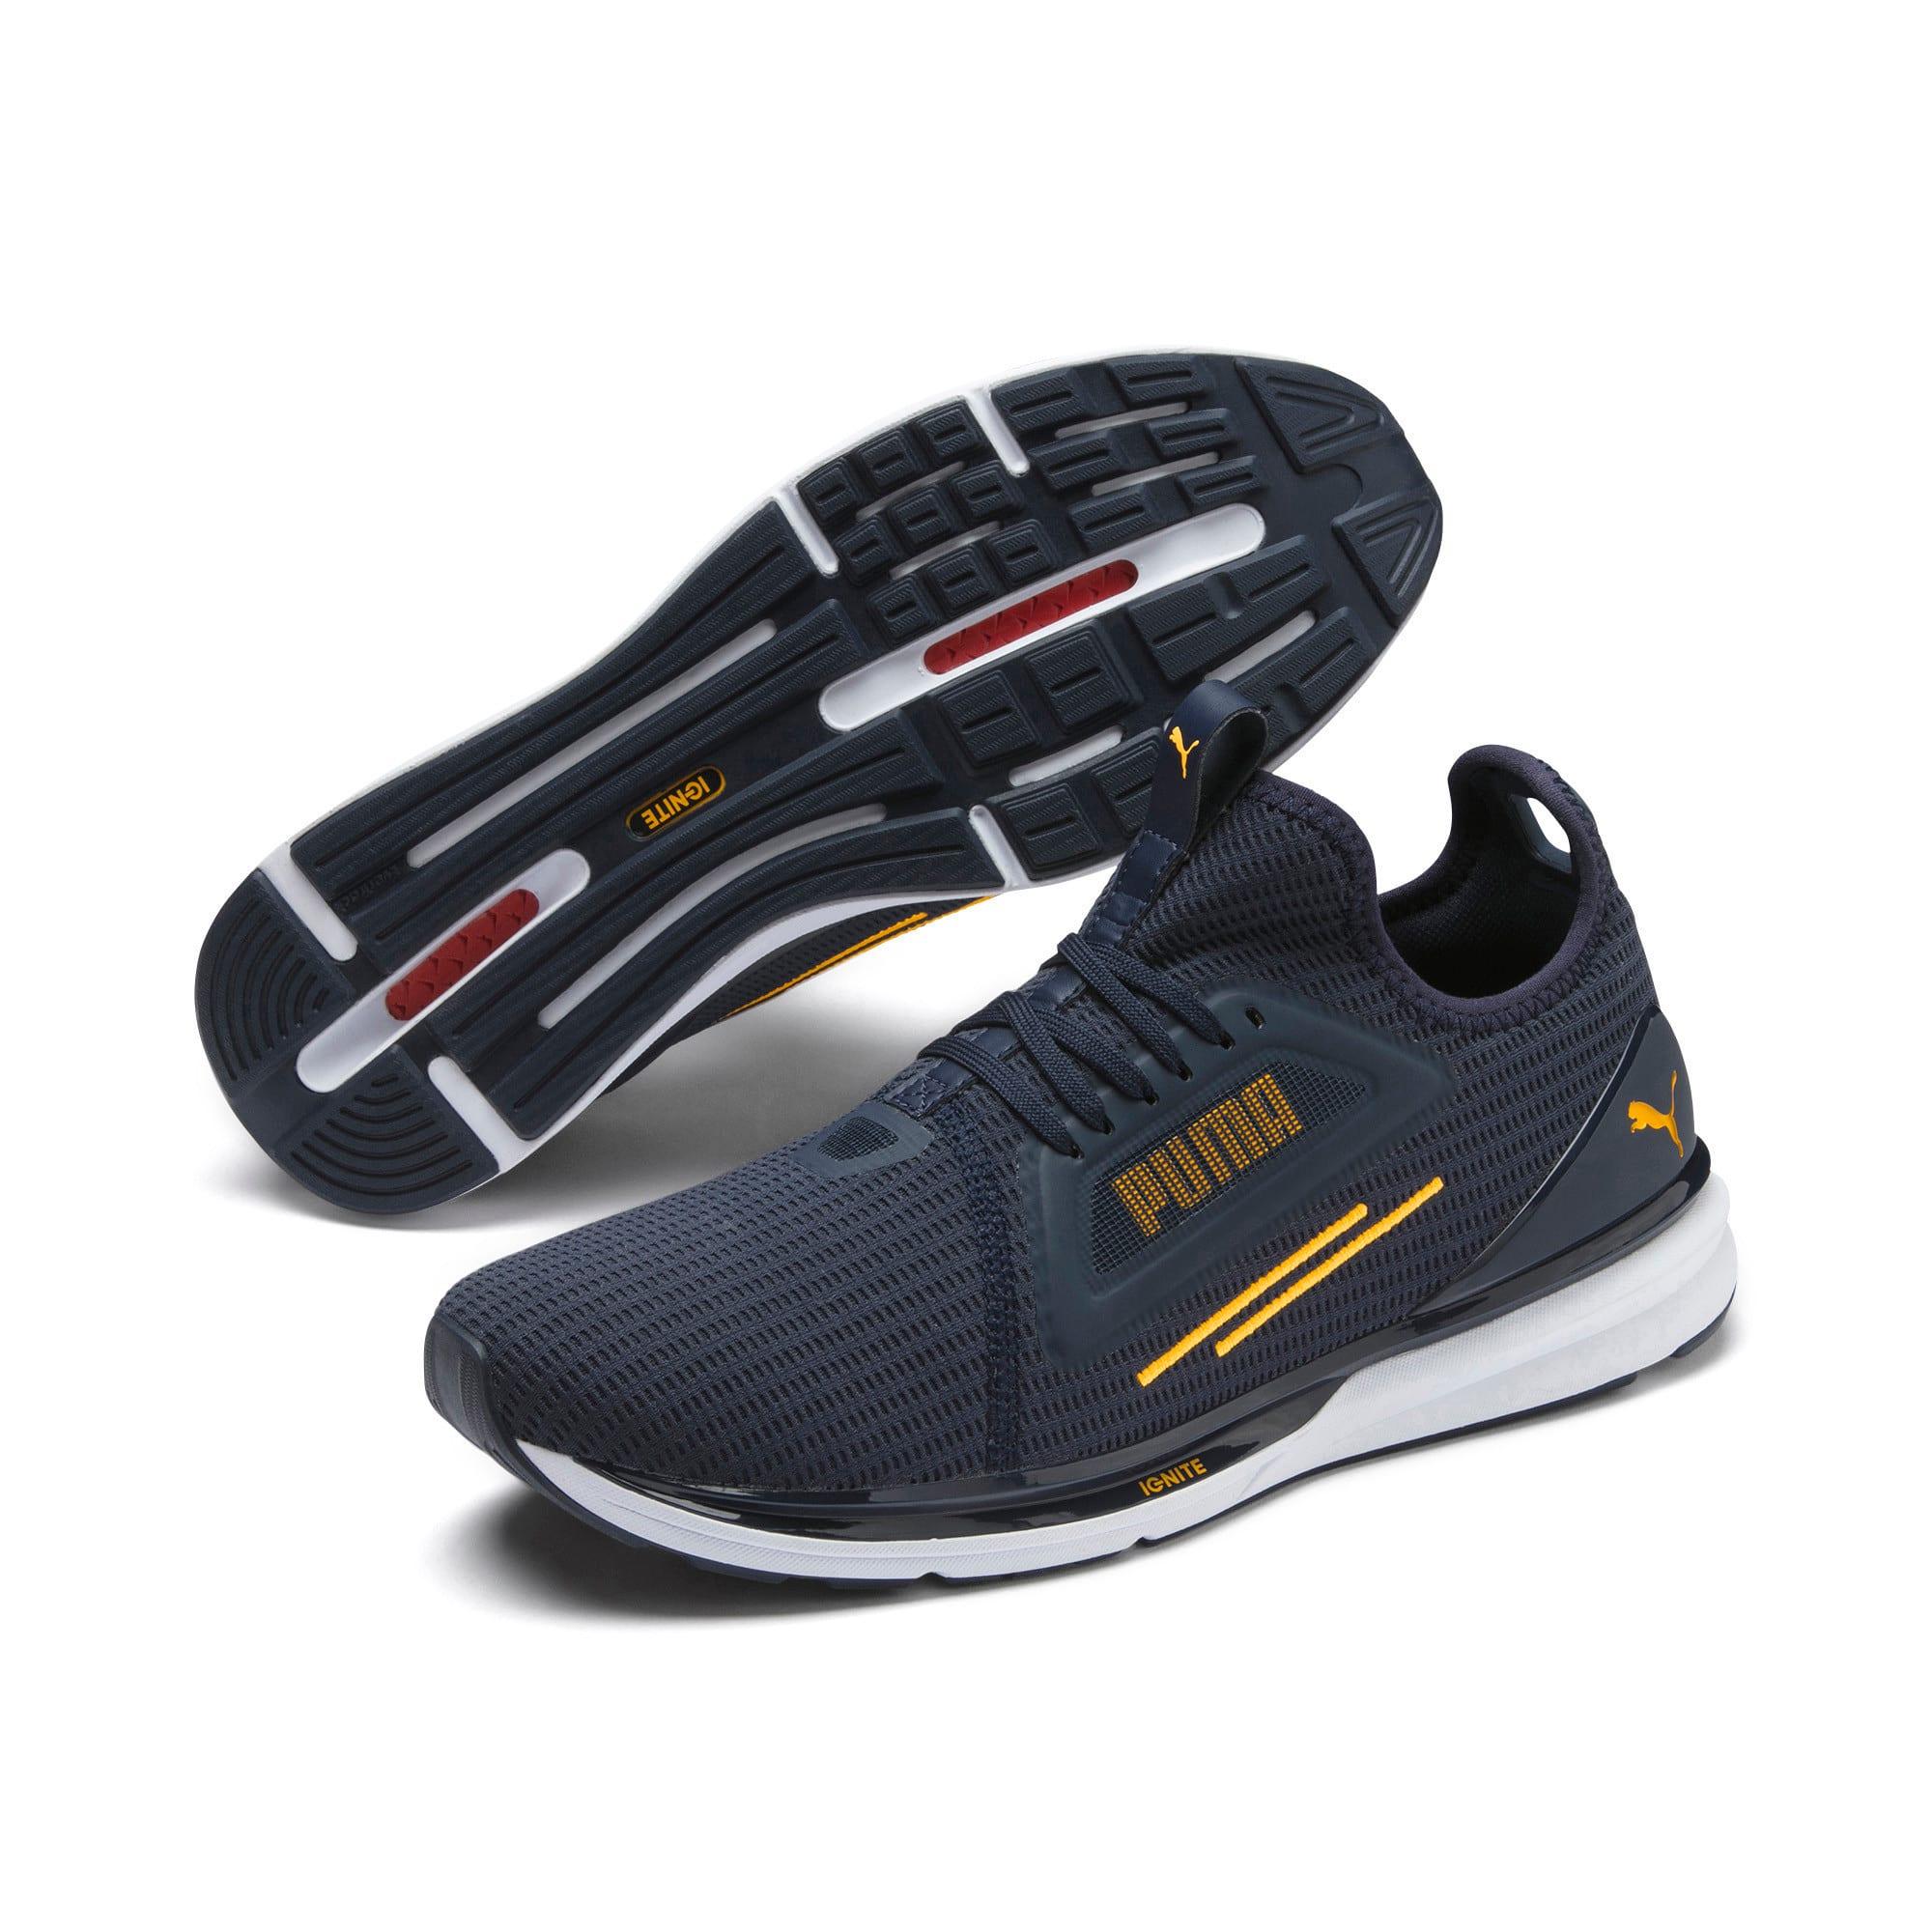 Thumbnail 8 of IGNITE Limitless Lean Running Shoes, Peacoat-Orange Alert, medium-IND